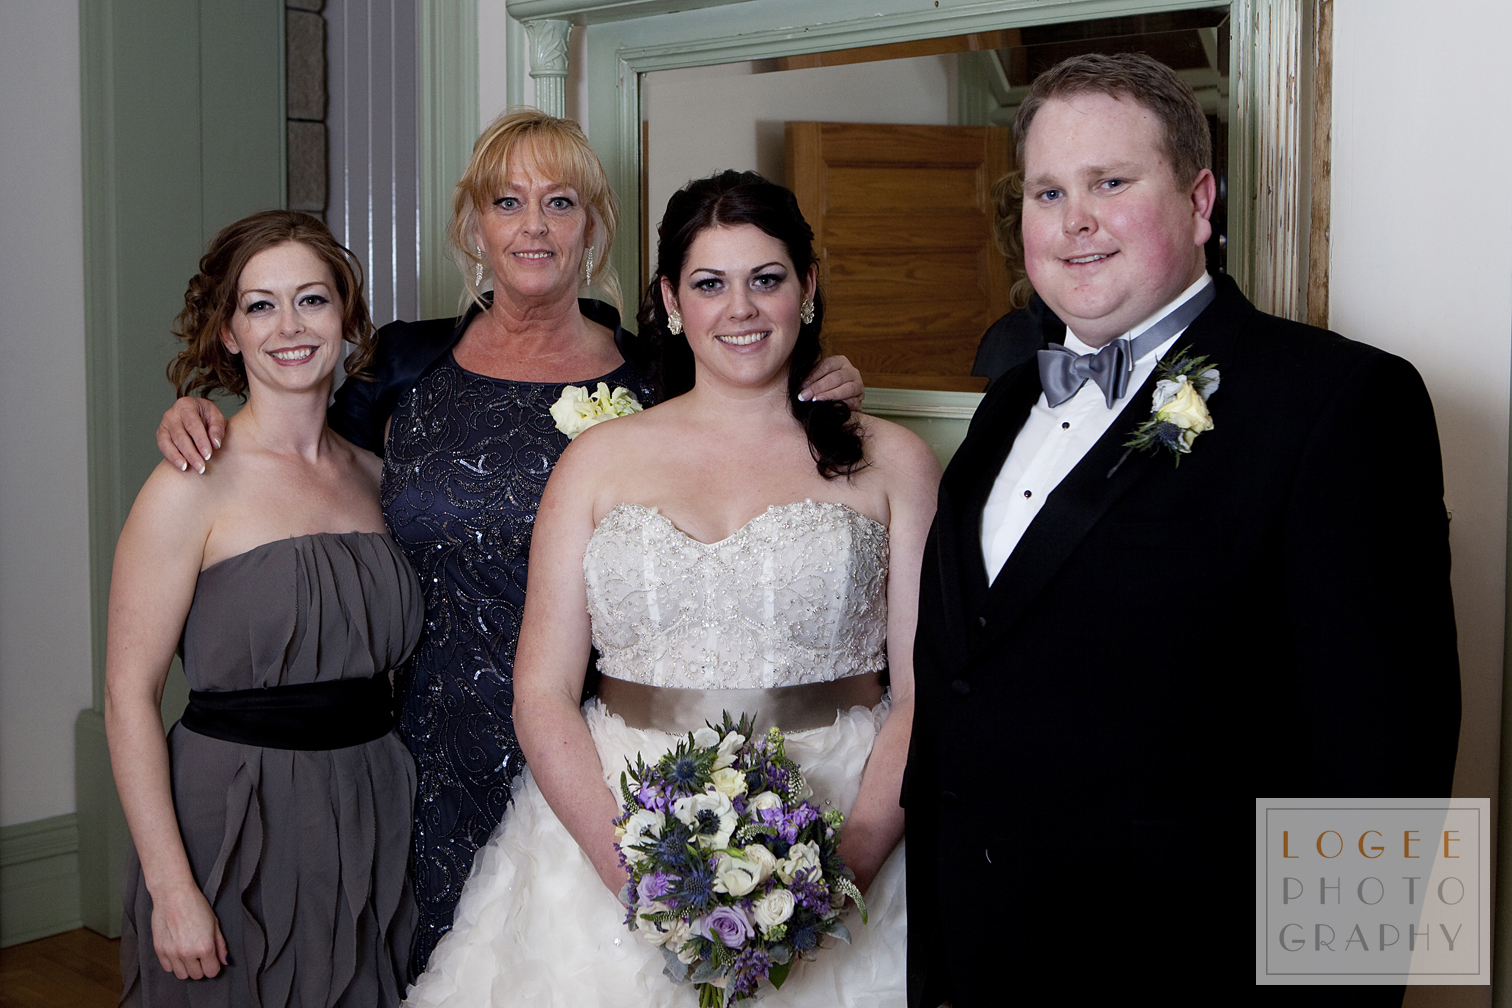 McIntosh-Burns Wedding - 7022Aw